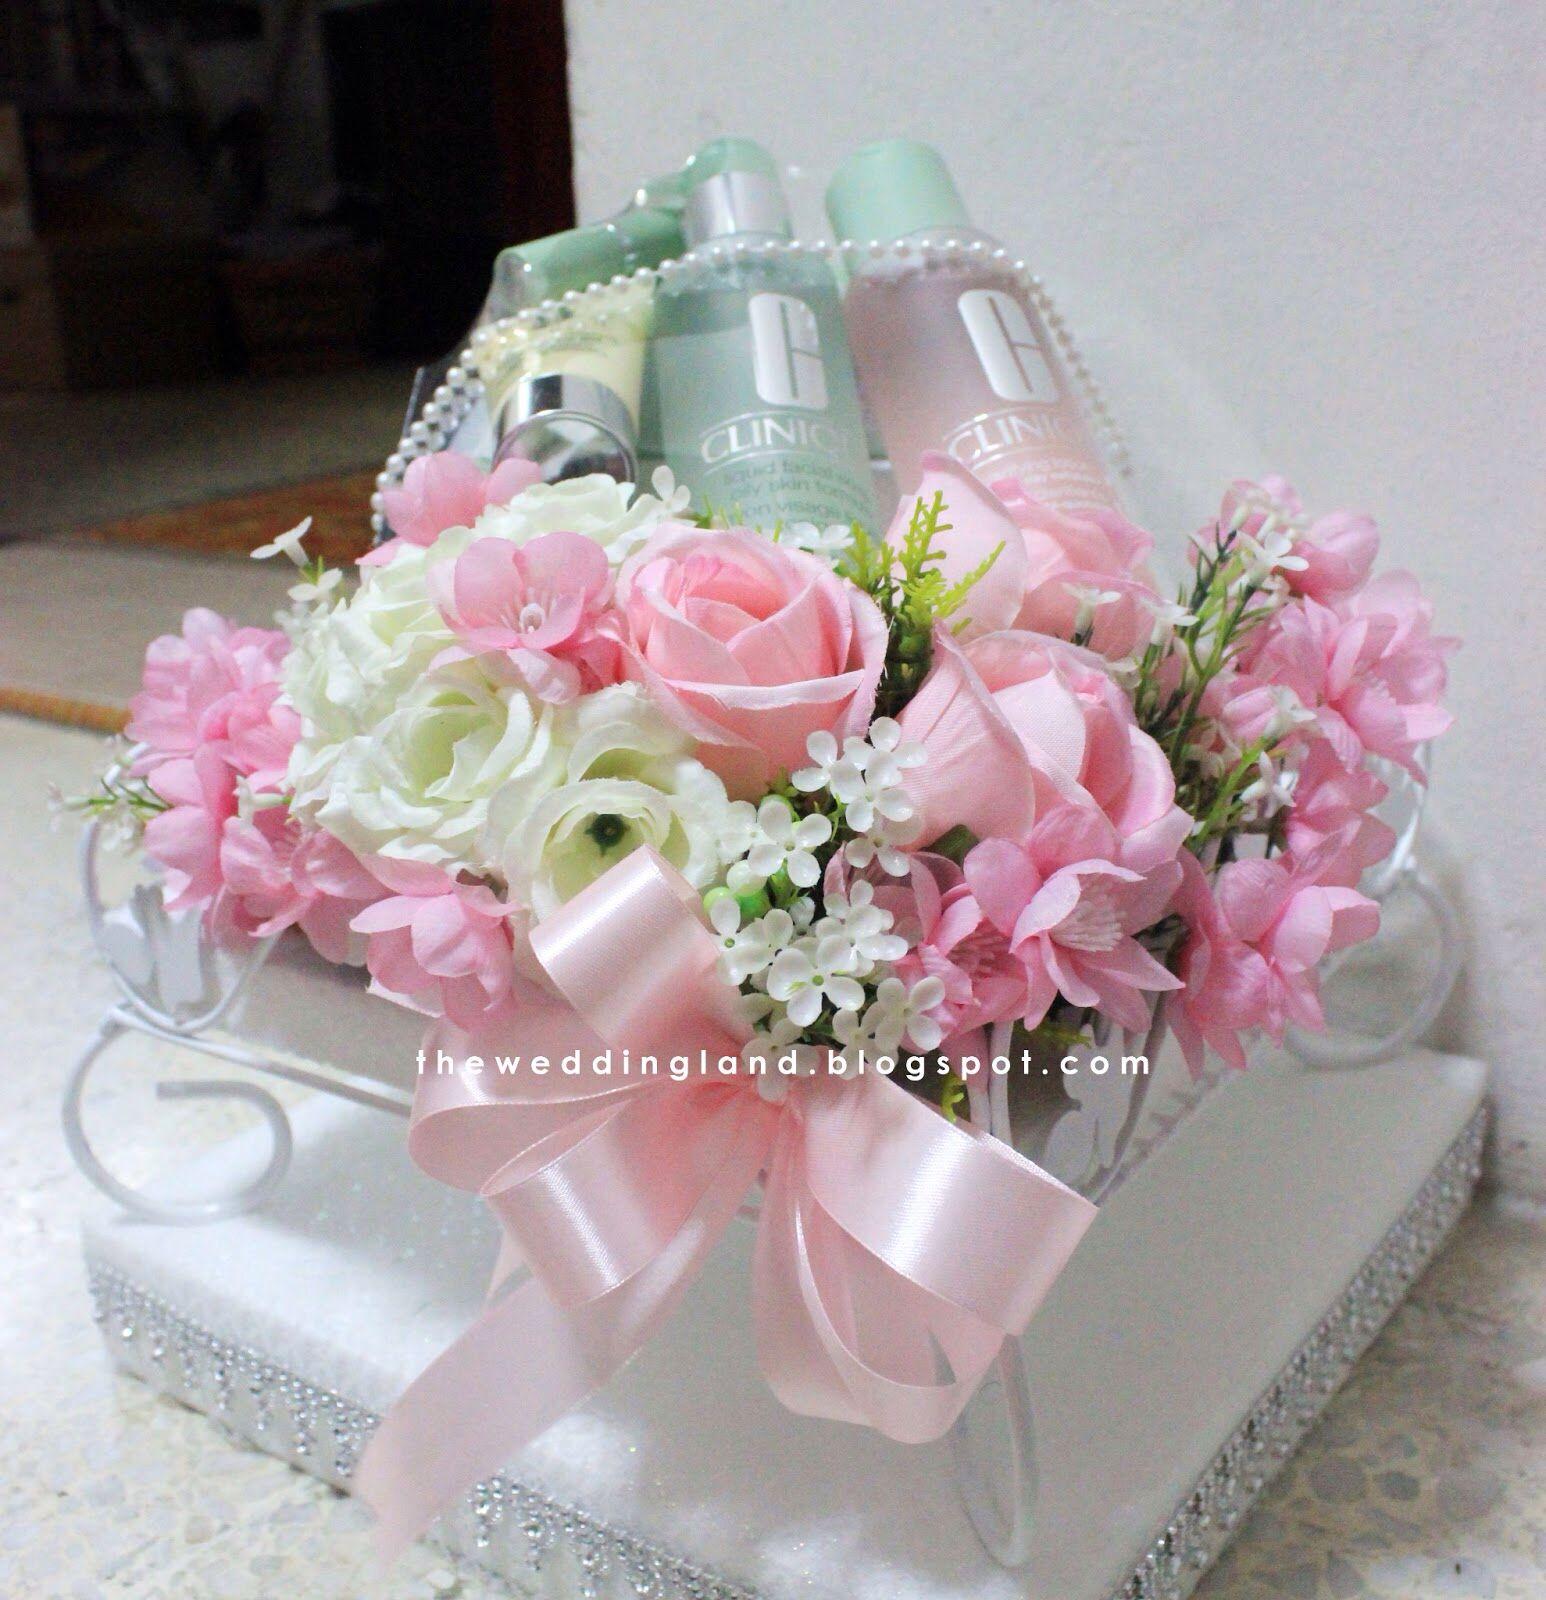 Malay Wedding Gifts: Lovely.Local.Wedding